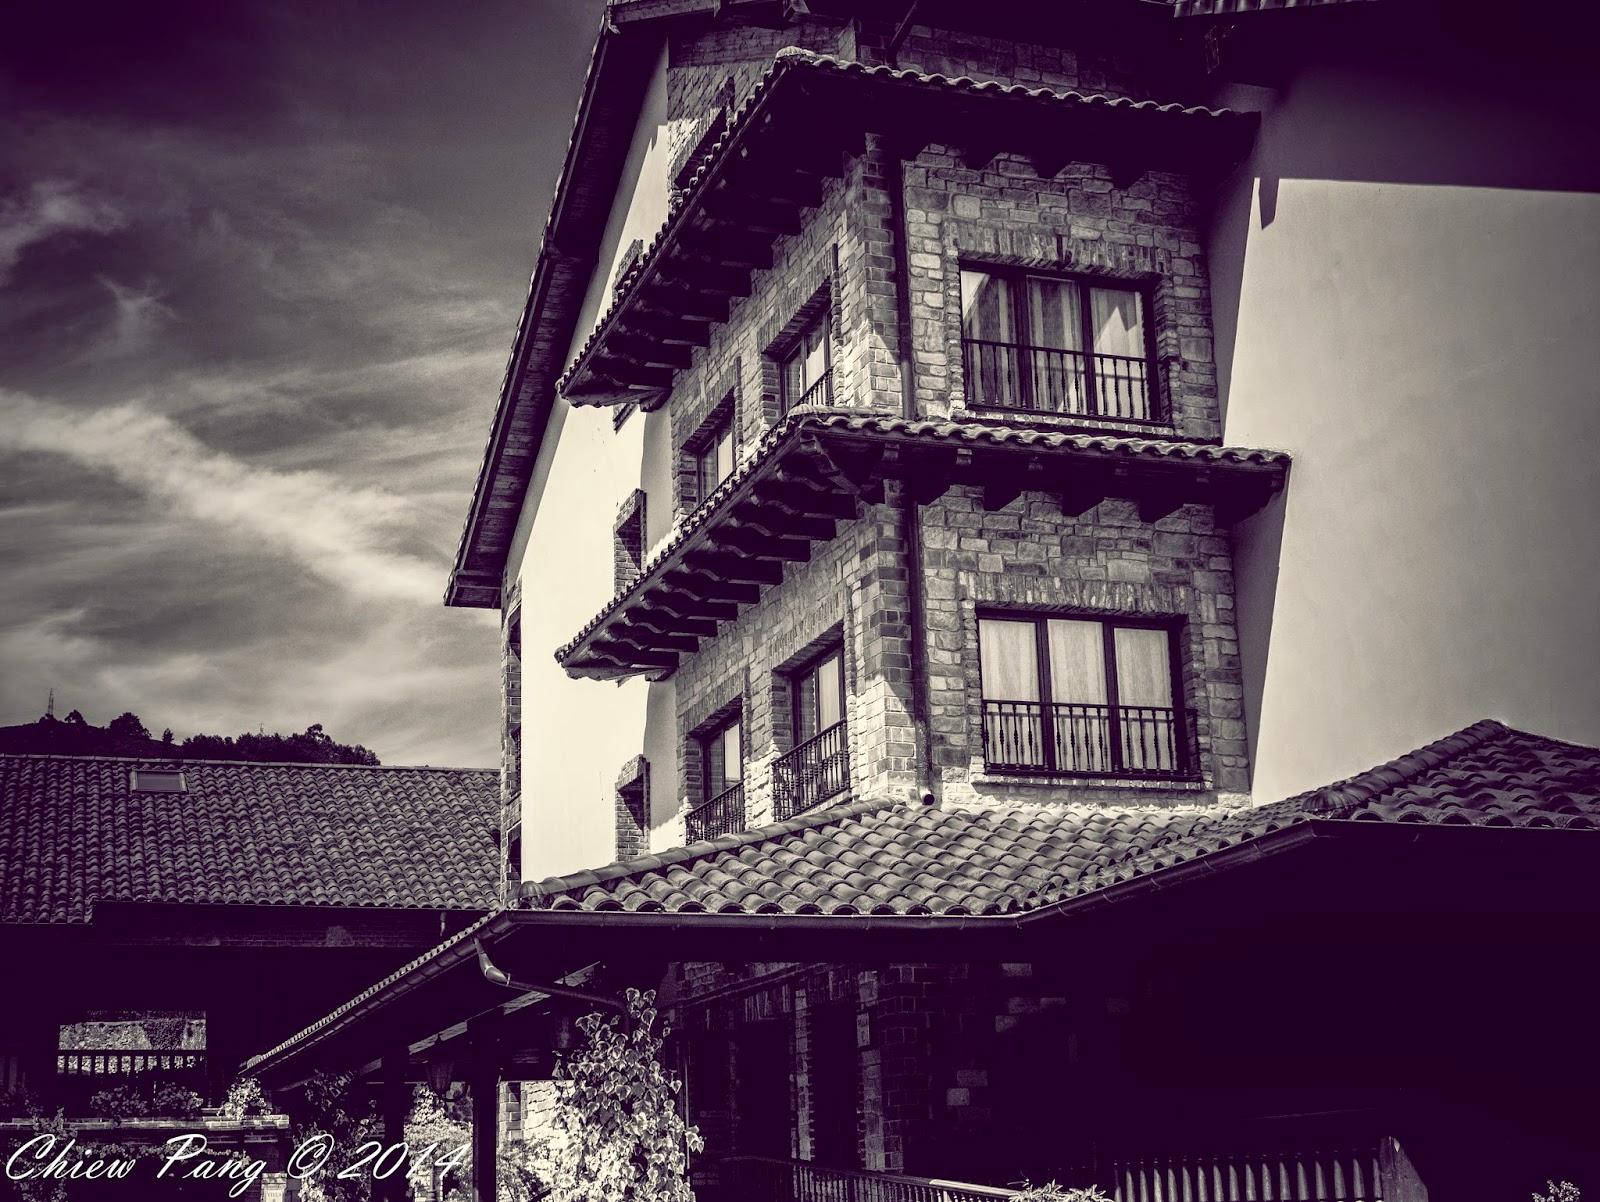 Hotel Peña Santa, Benia de Onis, Asturias